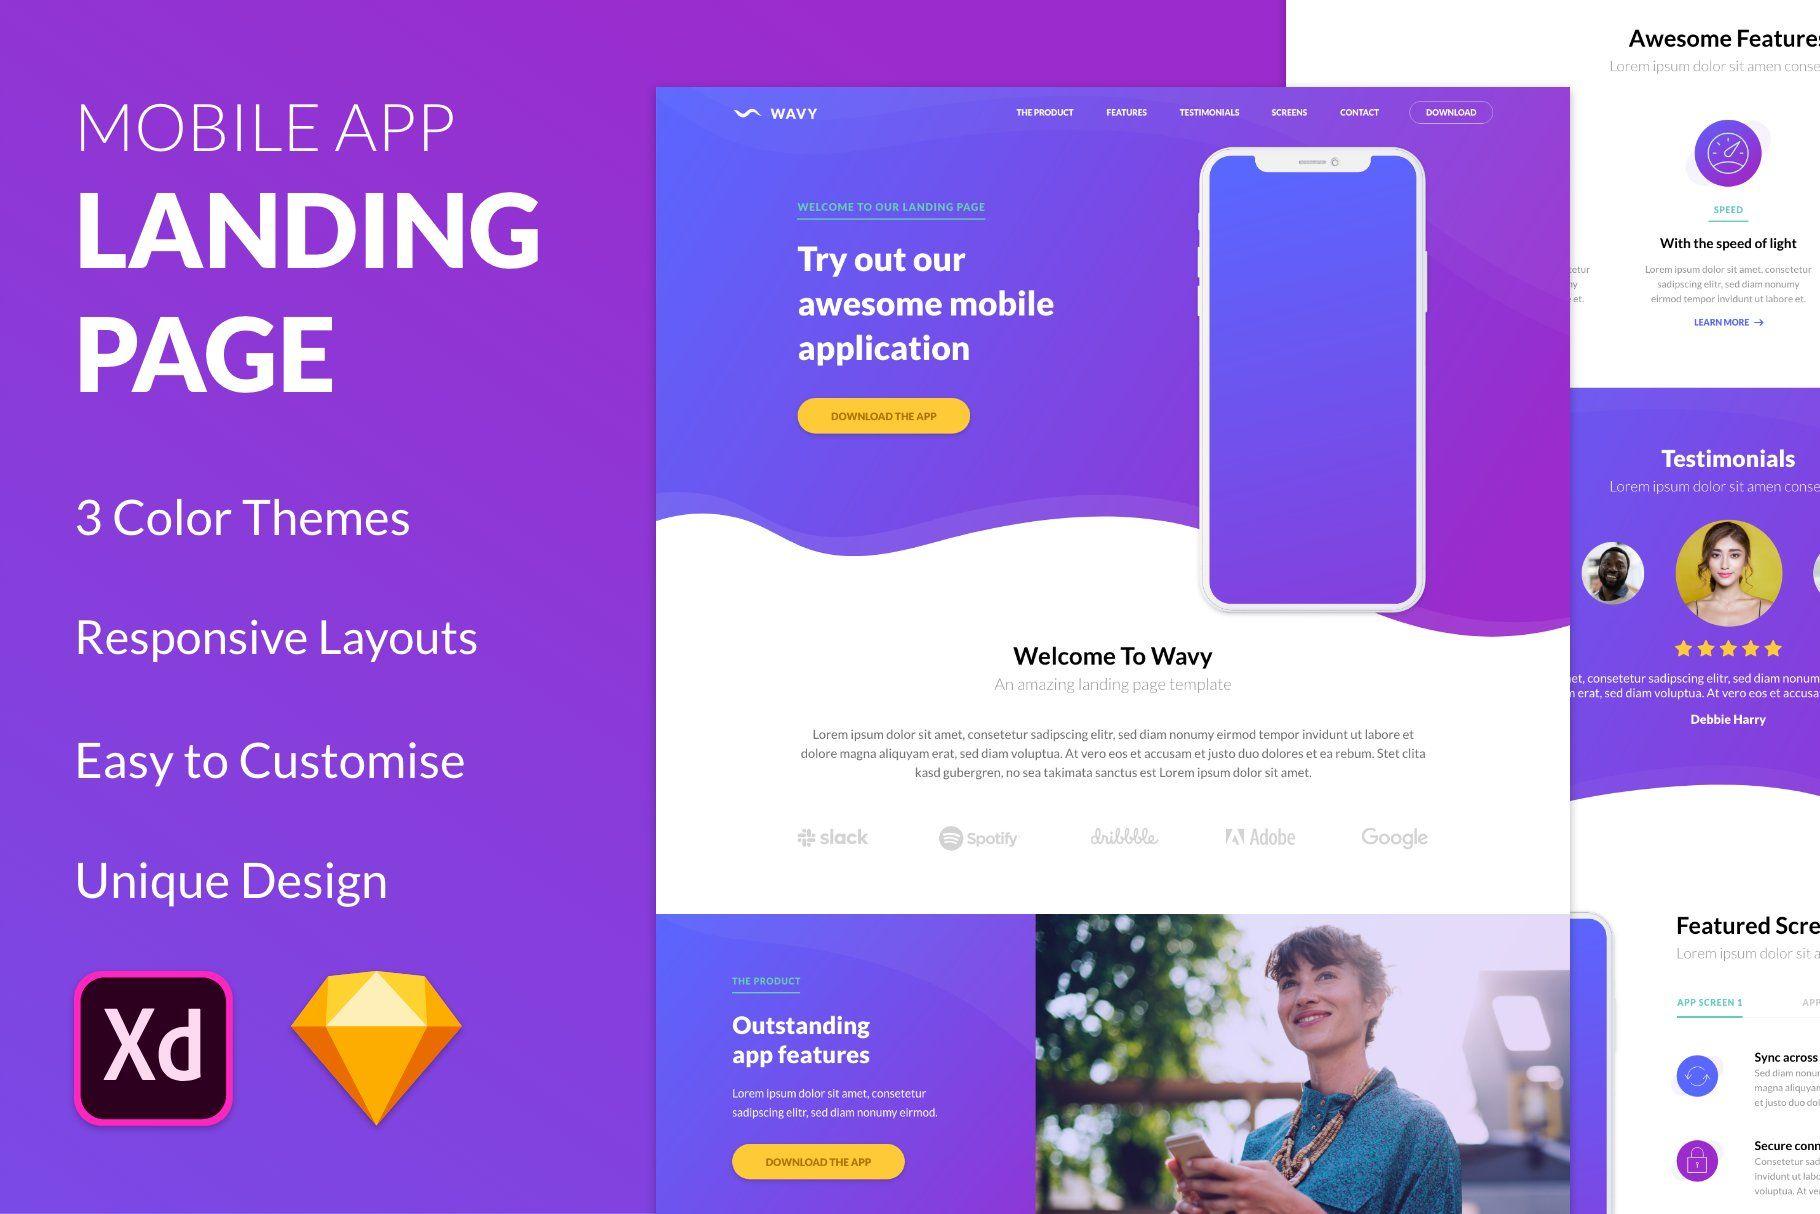 Mobile App Website Template from i.pinimg.com